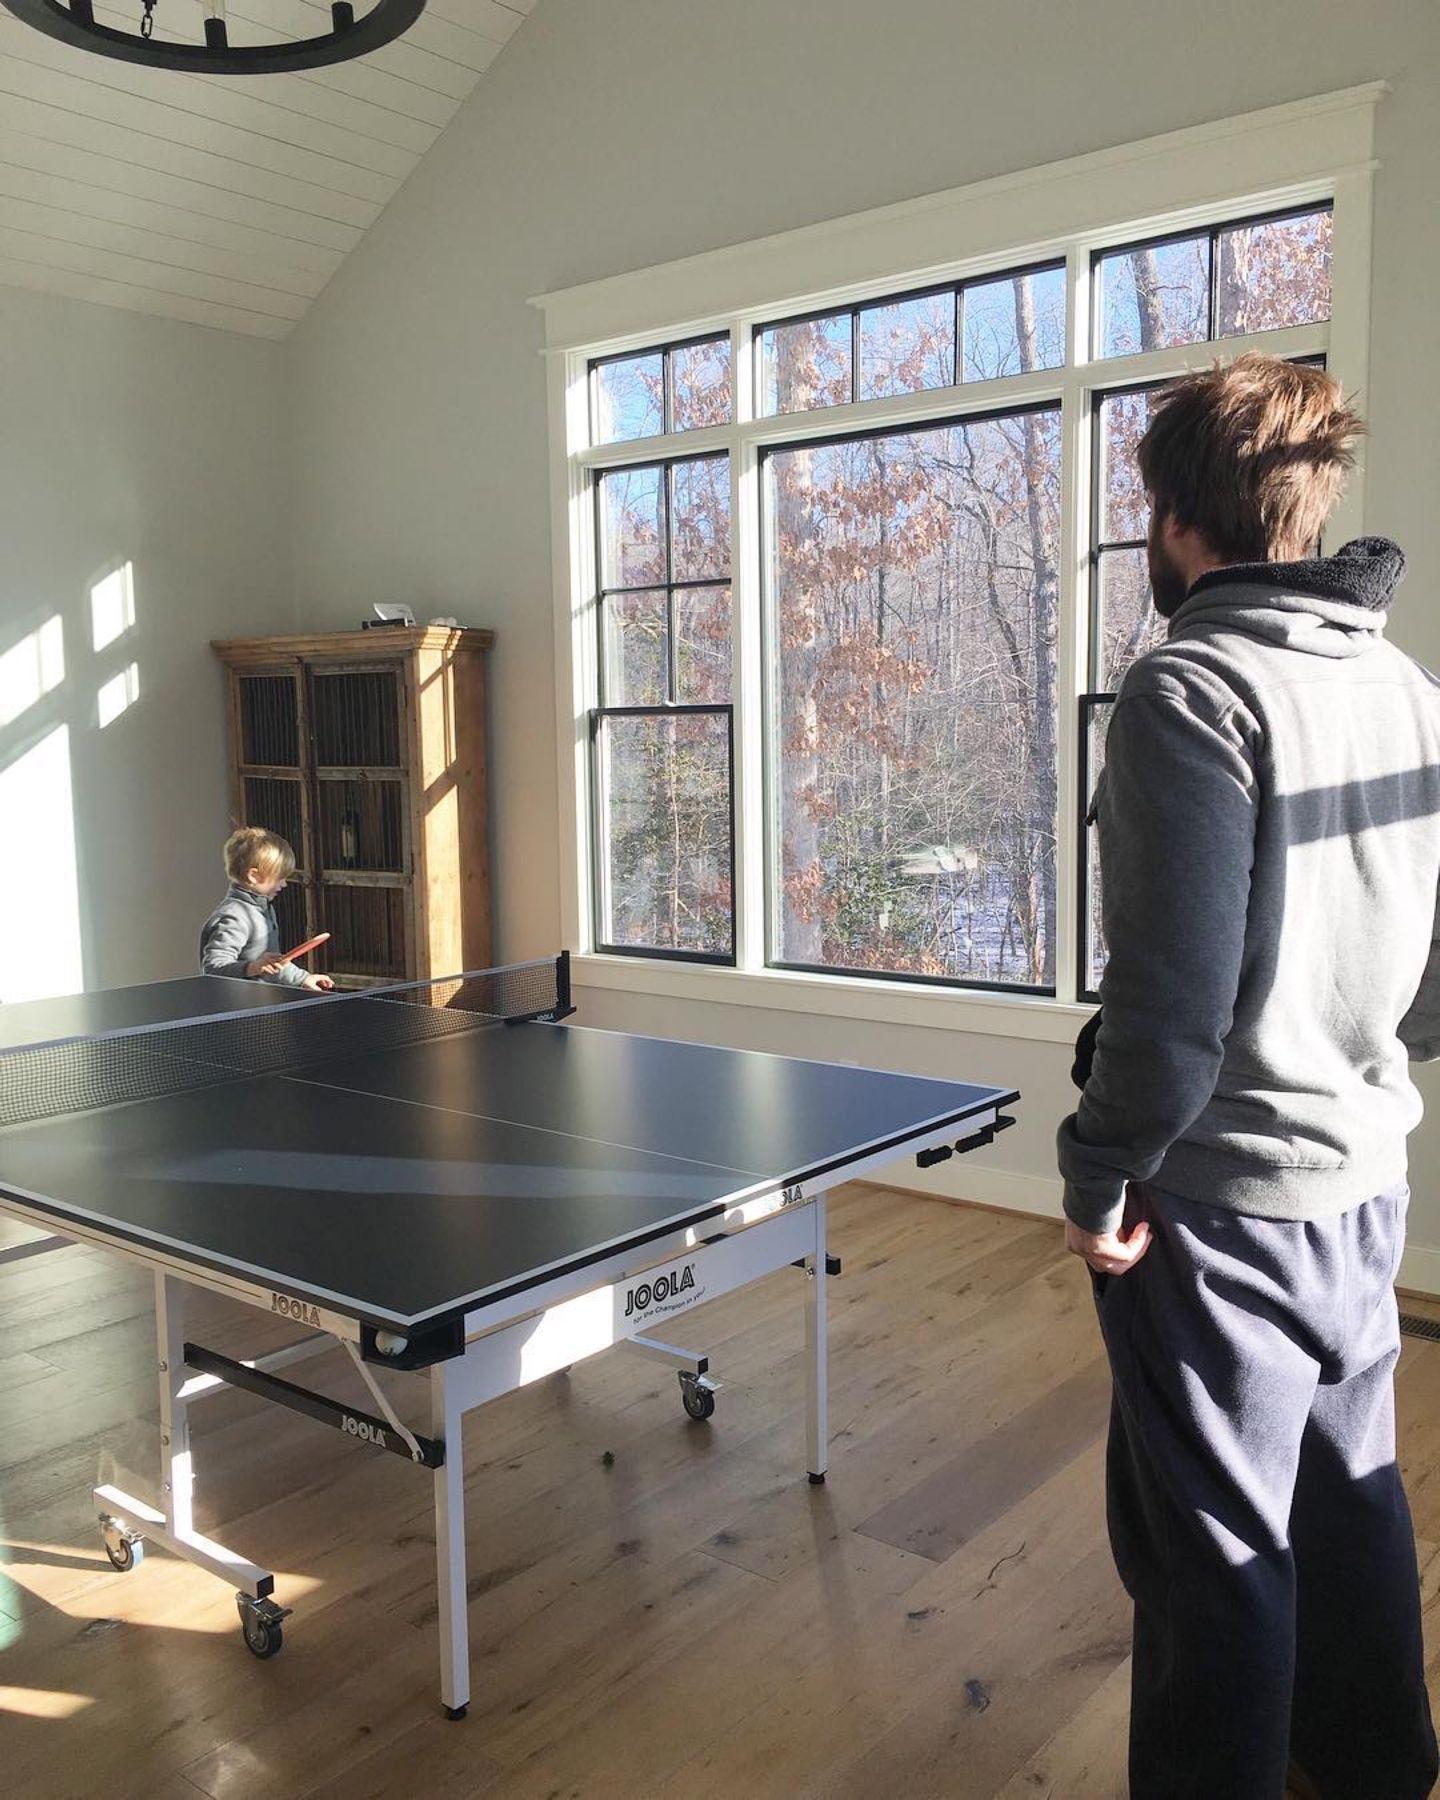 Joola Rapid Play 150 Table Tennis Table 15mm Joola Table Tennis Table New Homes